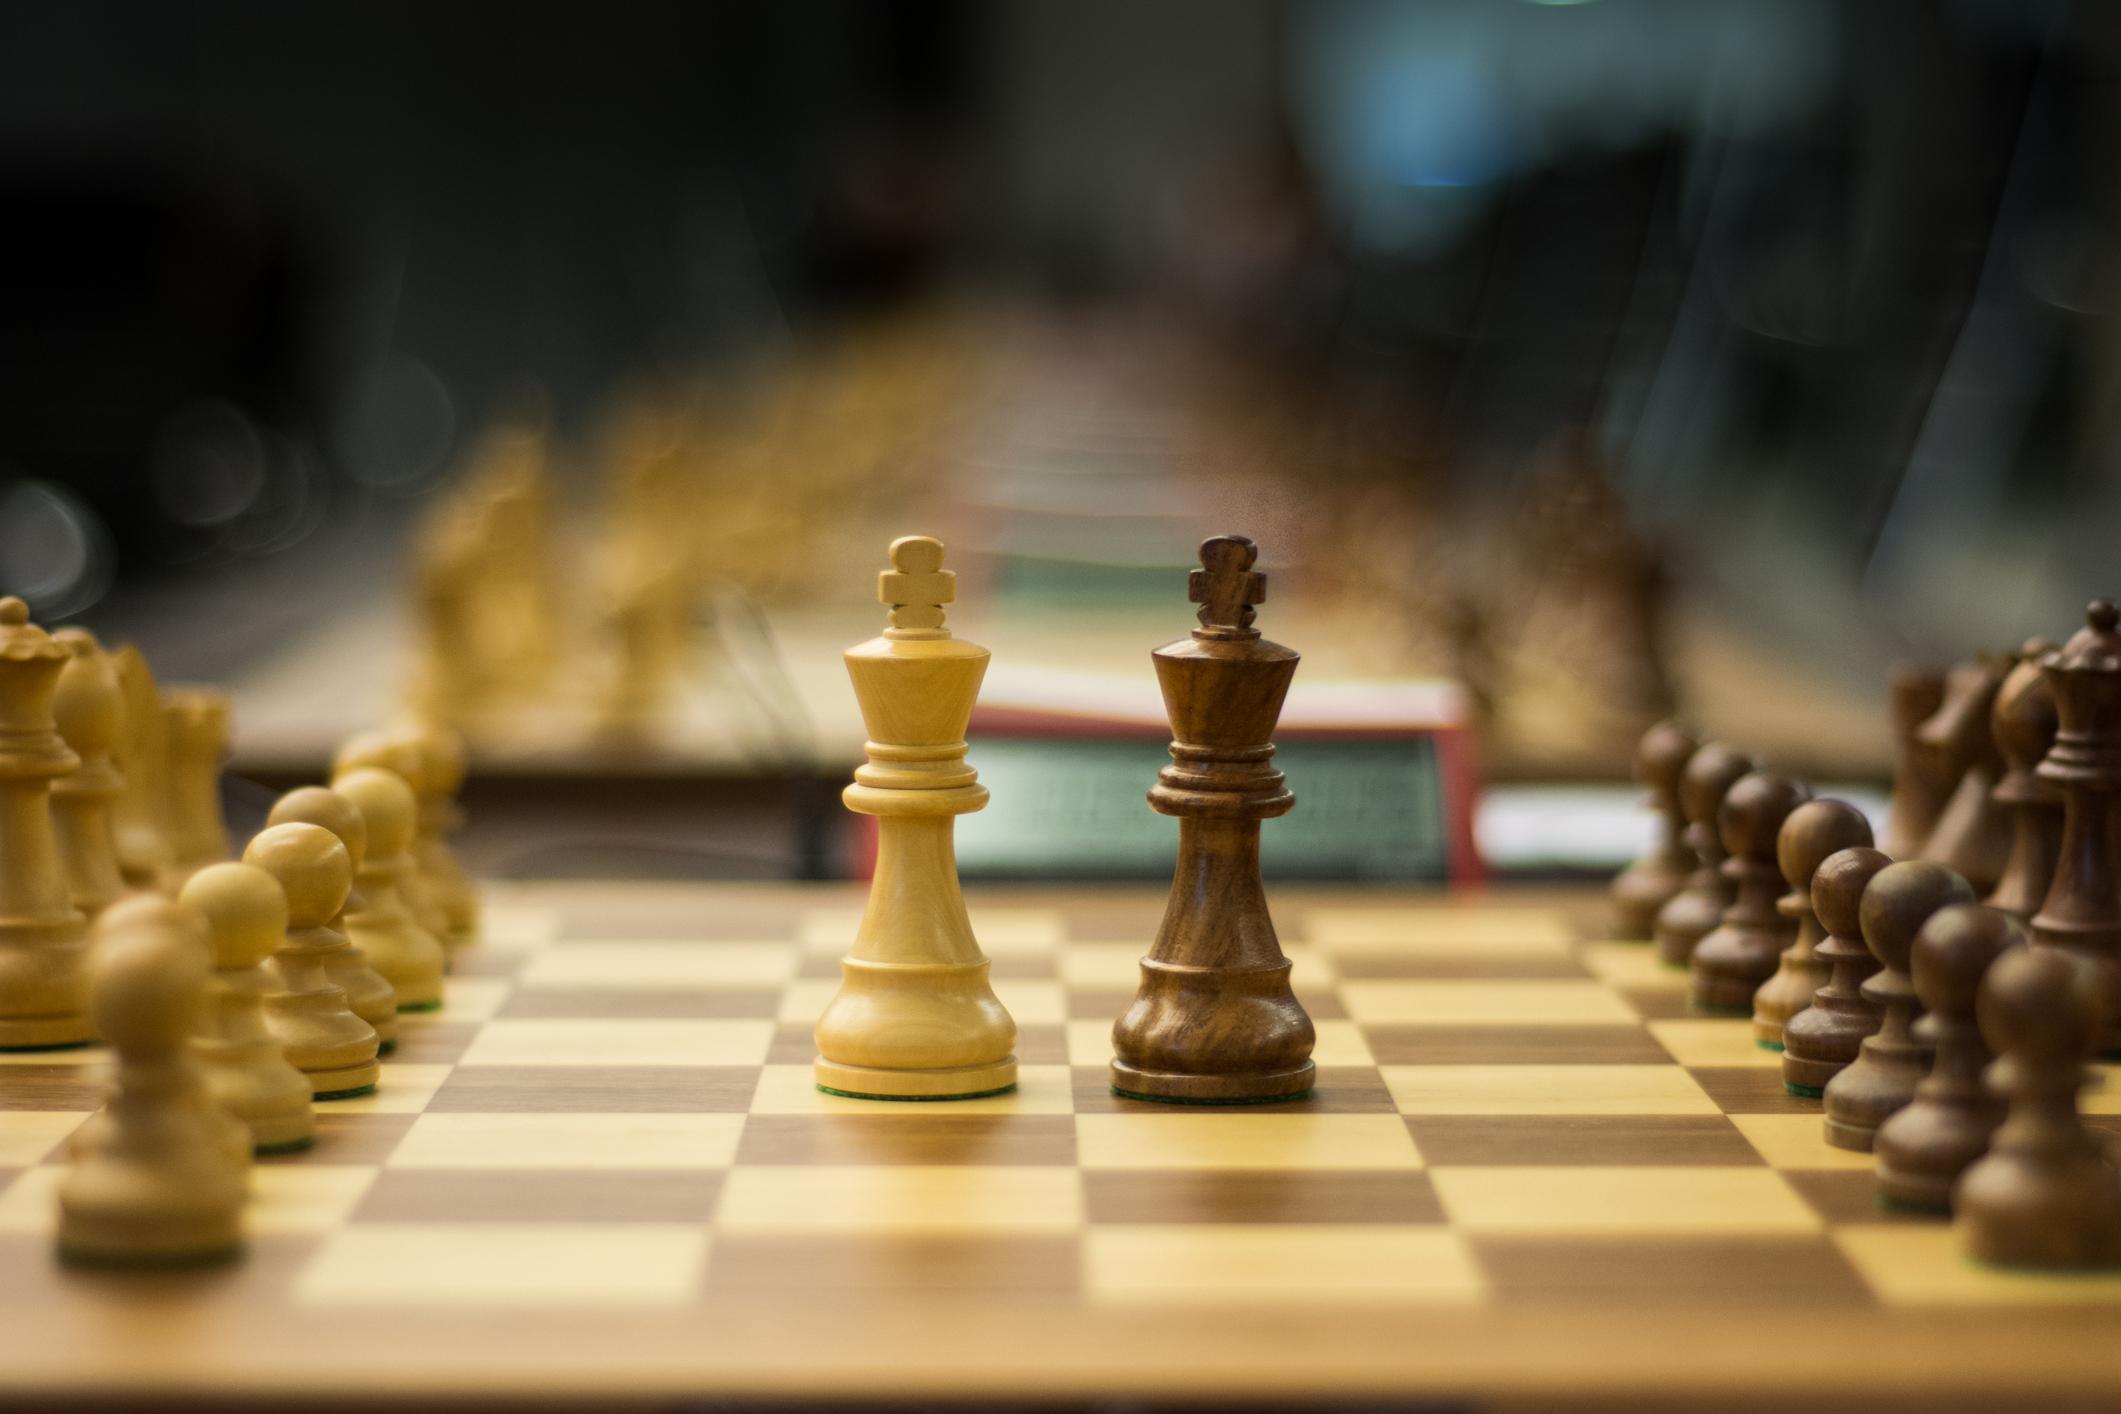 Летием картинками, фон для открытки шахматы